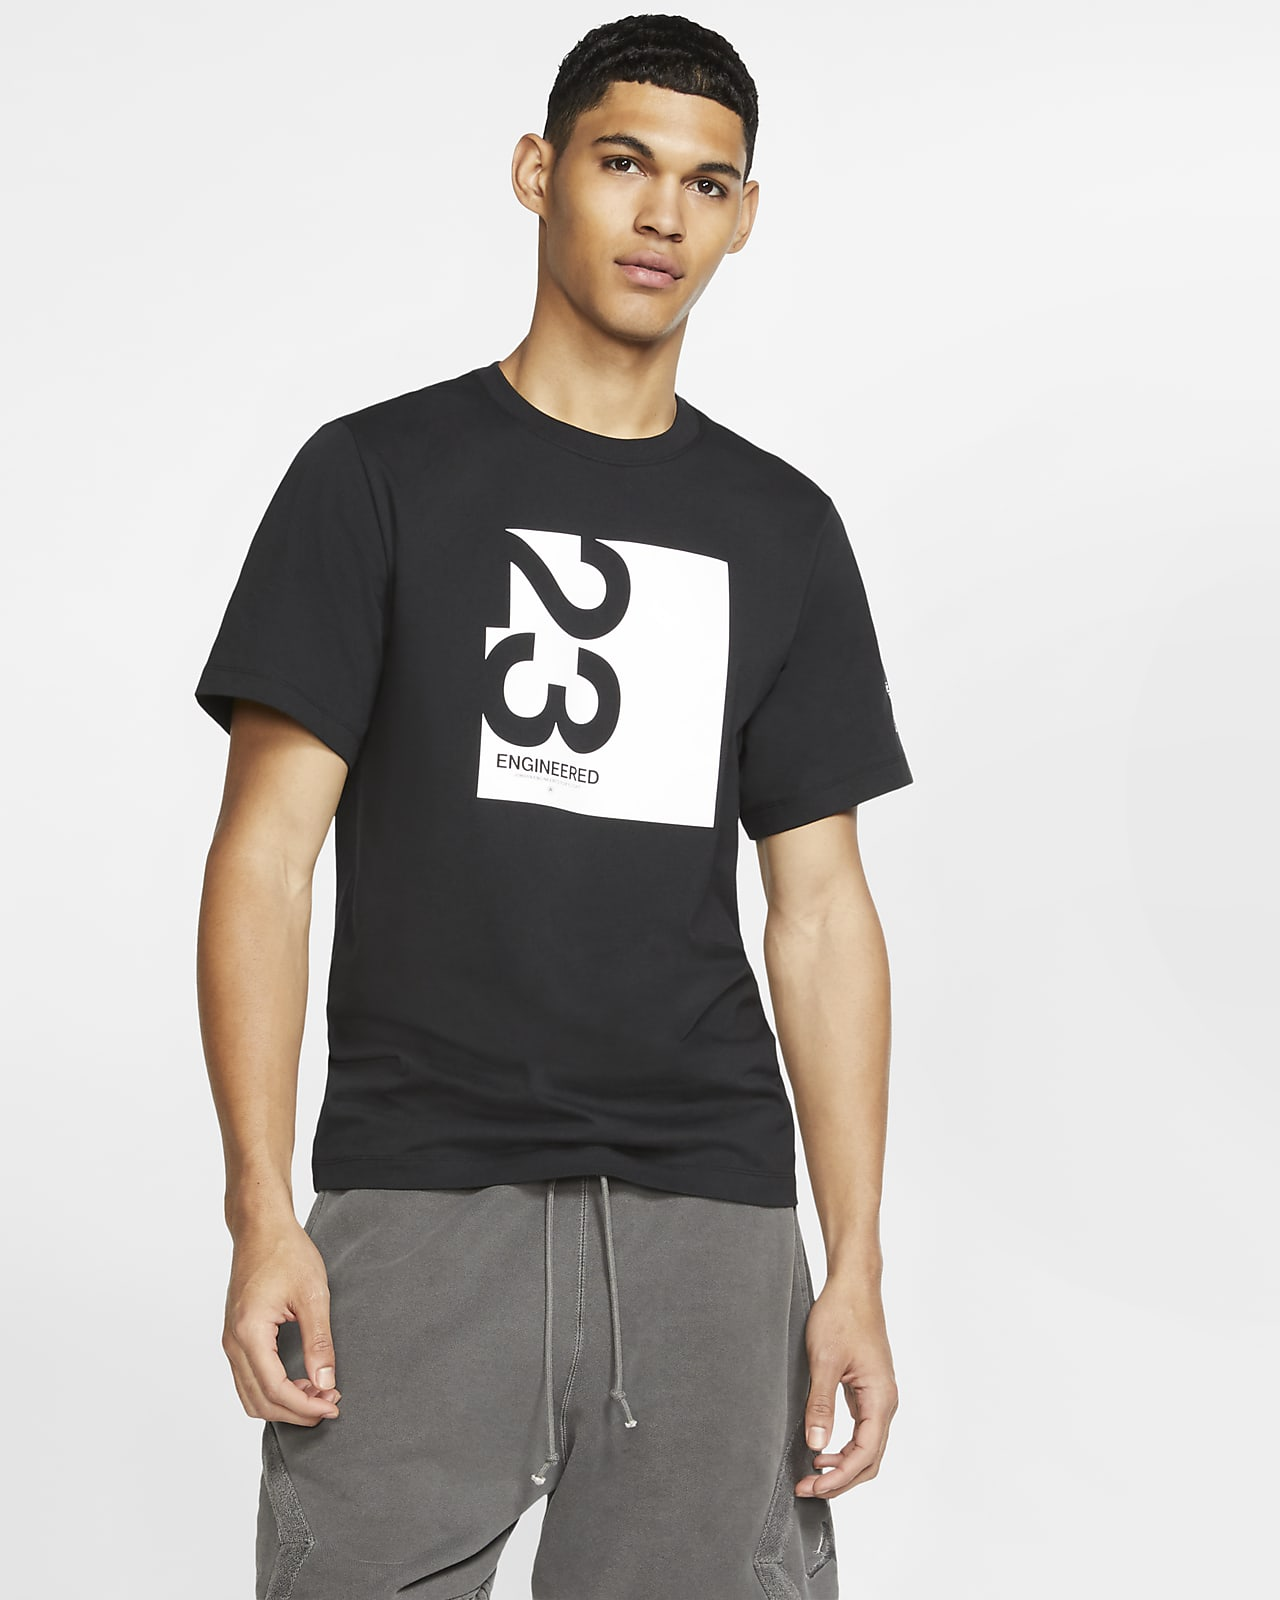 Jordan 23 Engineered Men's T-Shirt